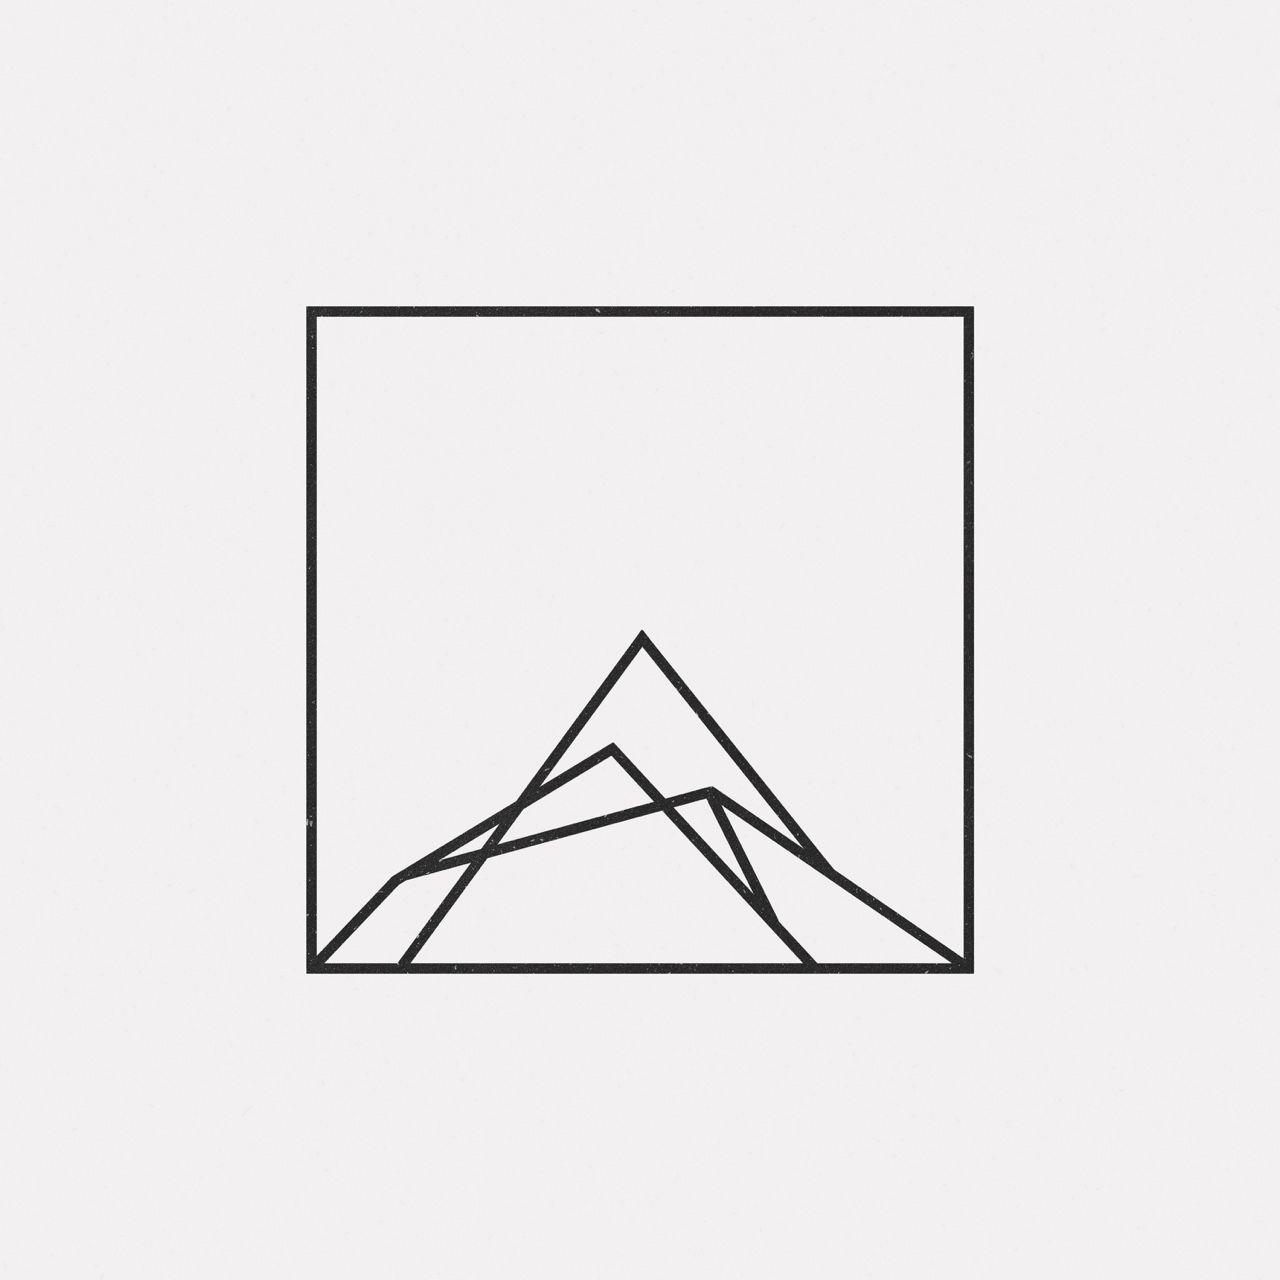 Simple Geometric Line Art : Dailyminimal ma a new geometric design every day